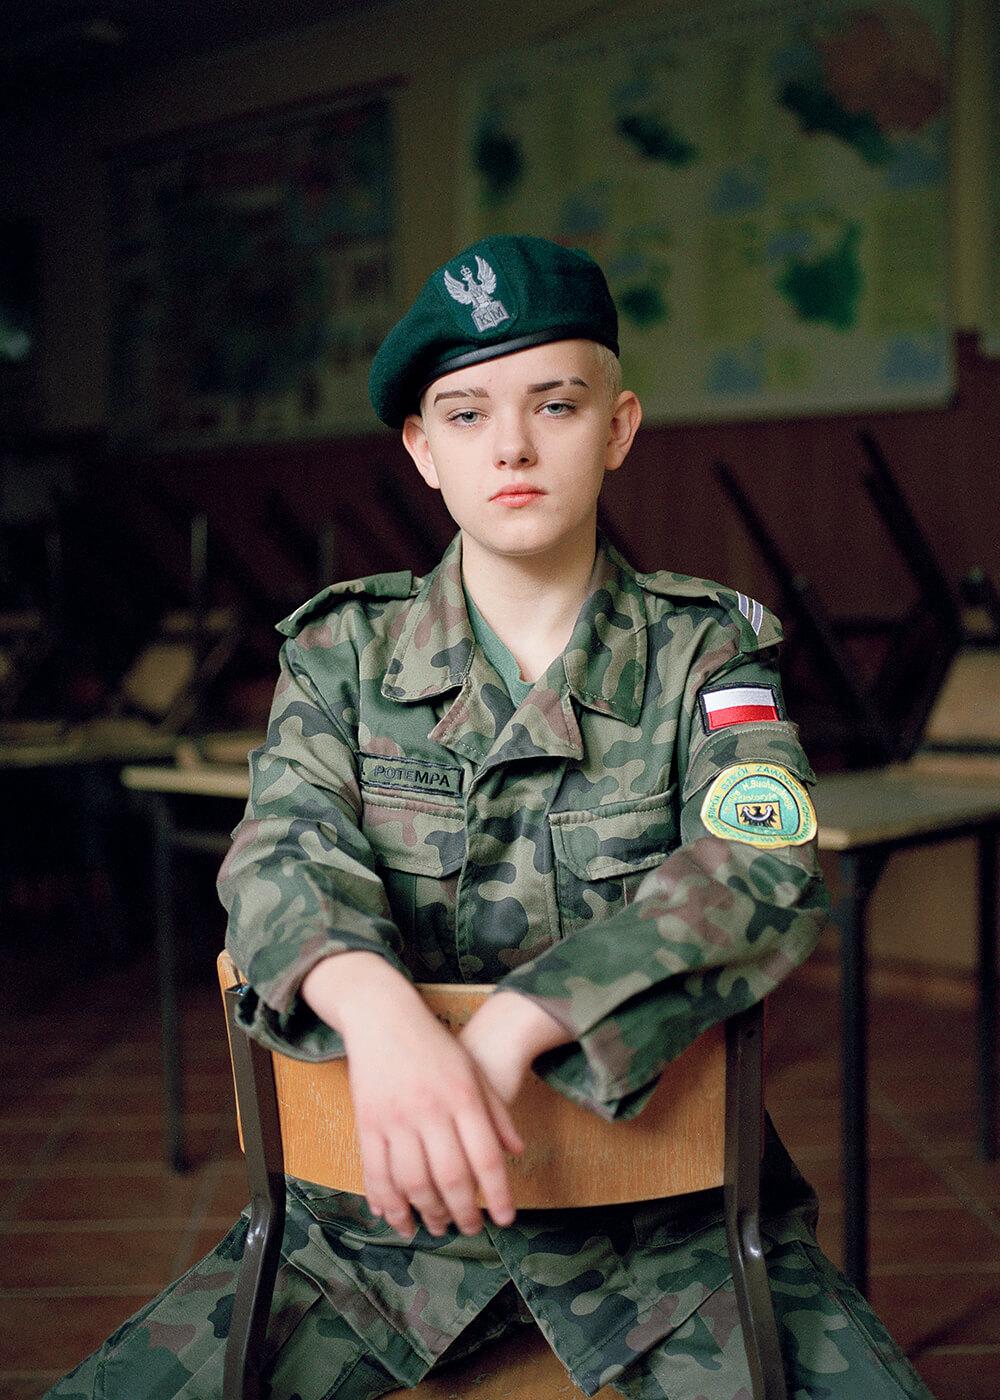 Natalia Kepesz